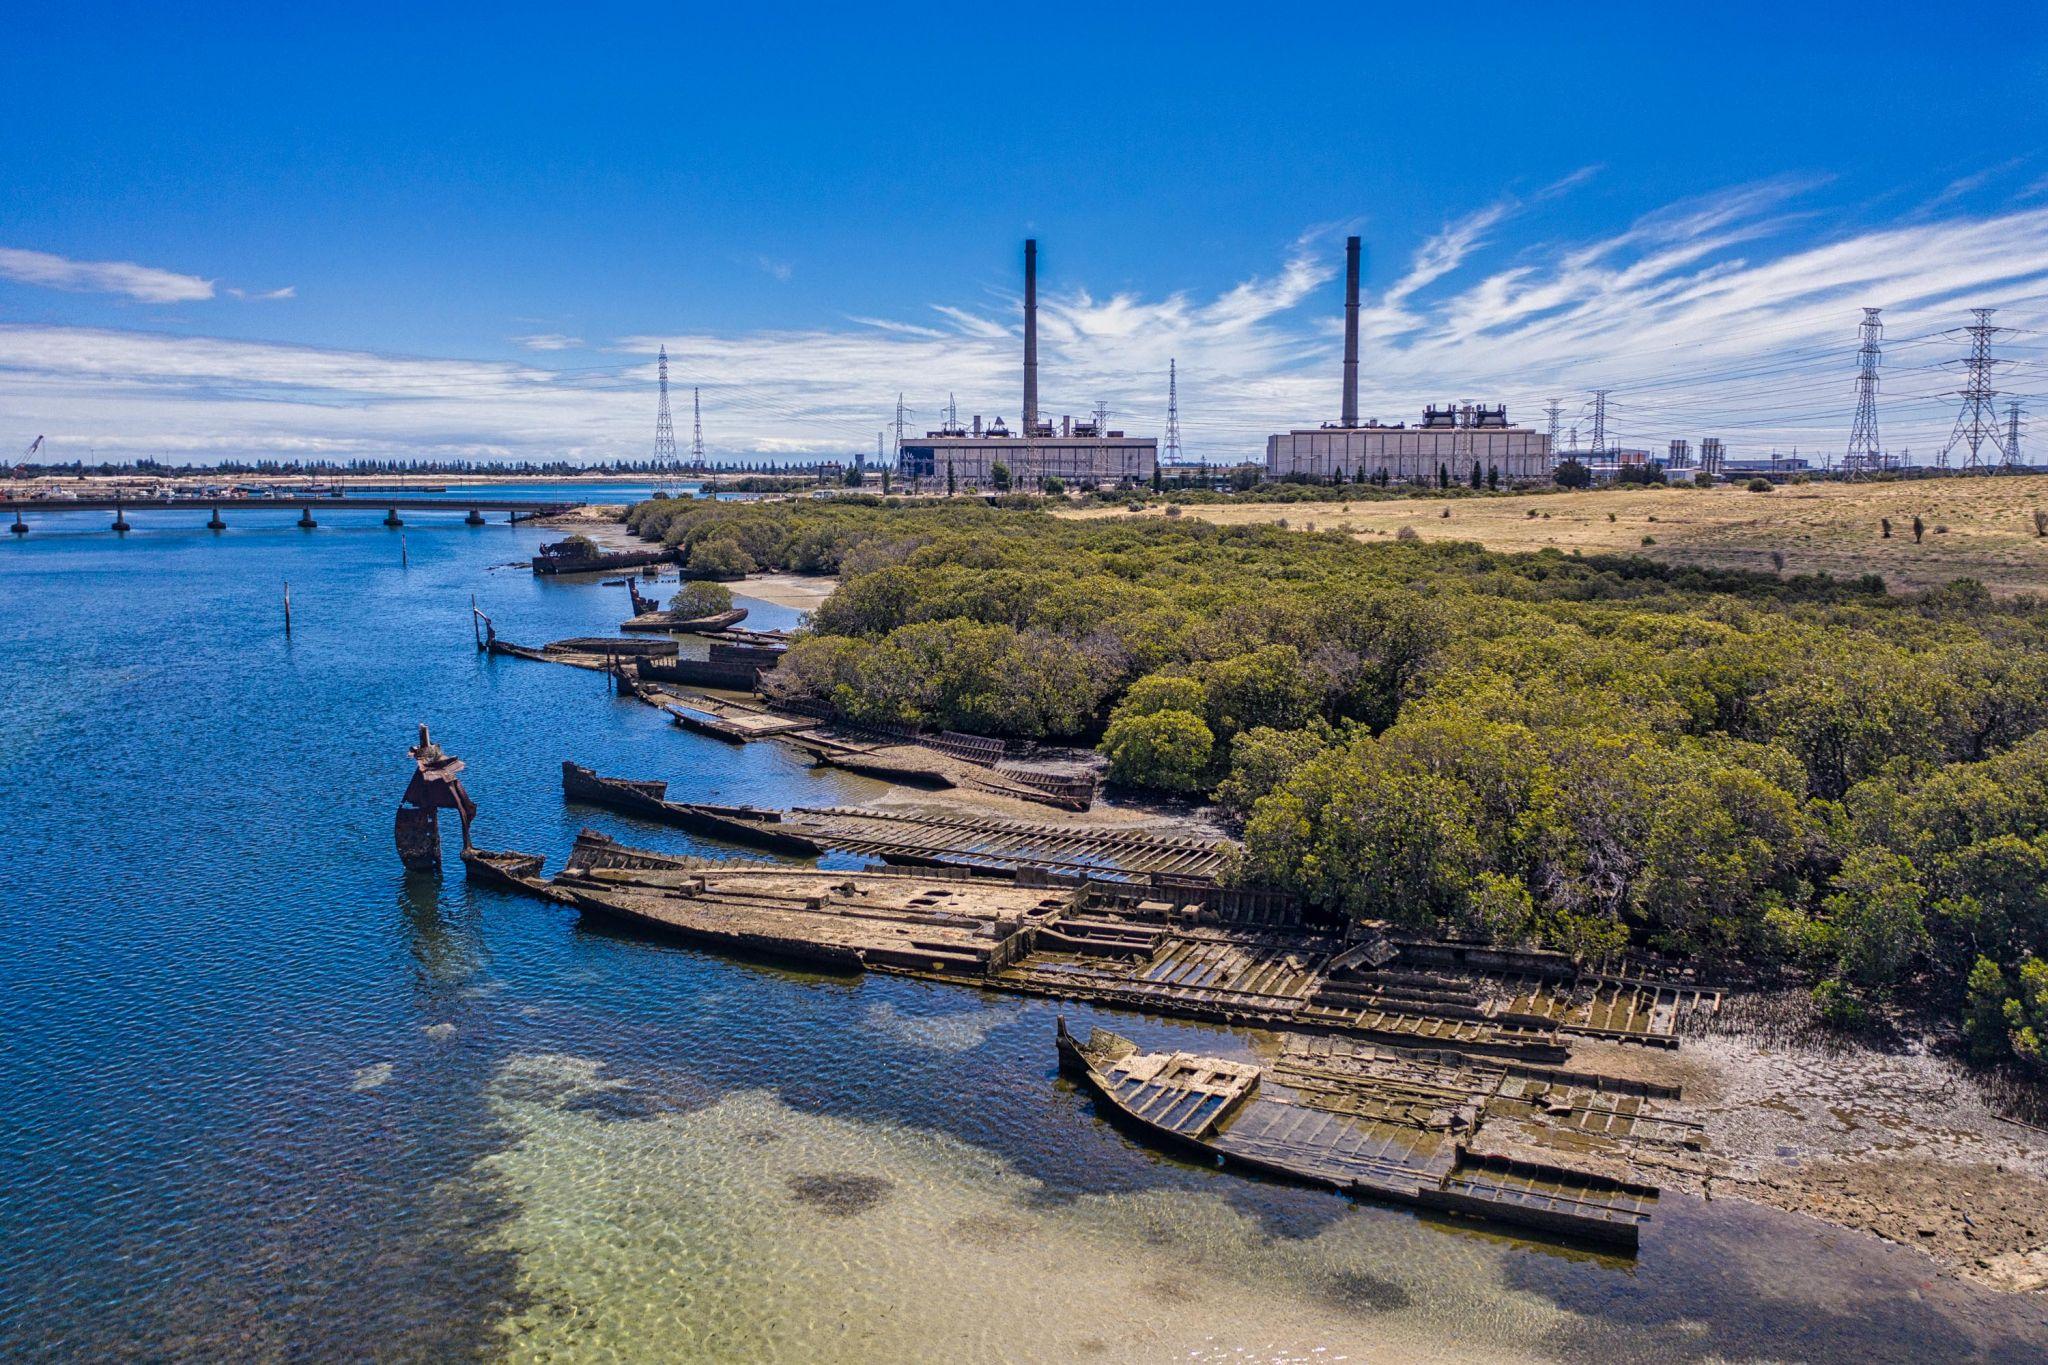 Garden Island Ships Graveyard, Port Adelaide, SA, Australia